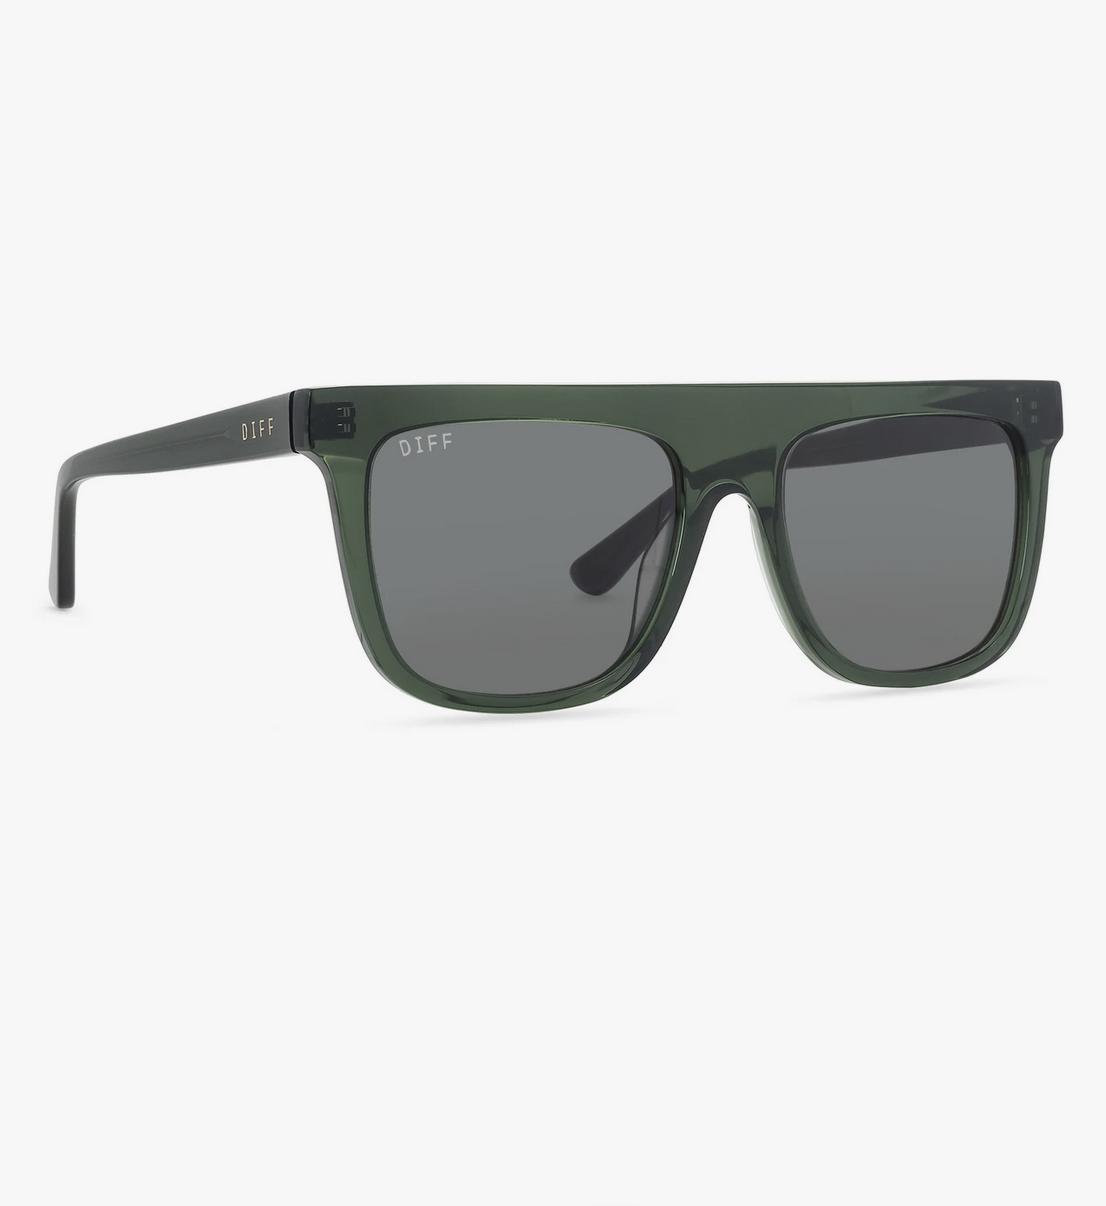 Diff Eyewear stevie - sea grass + g15 lens